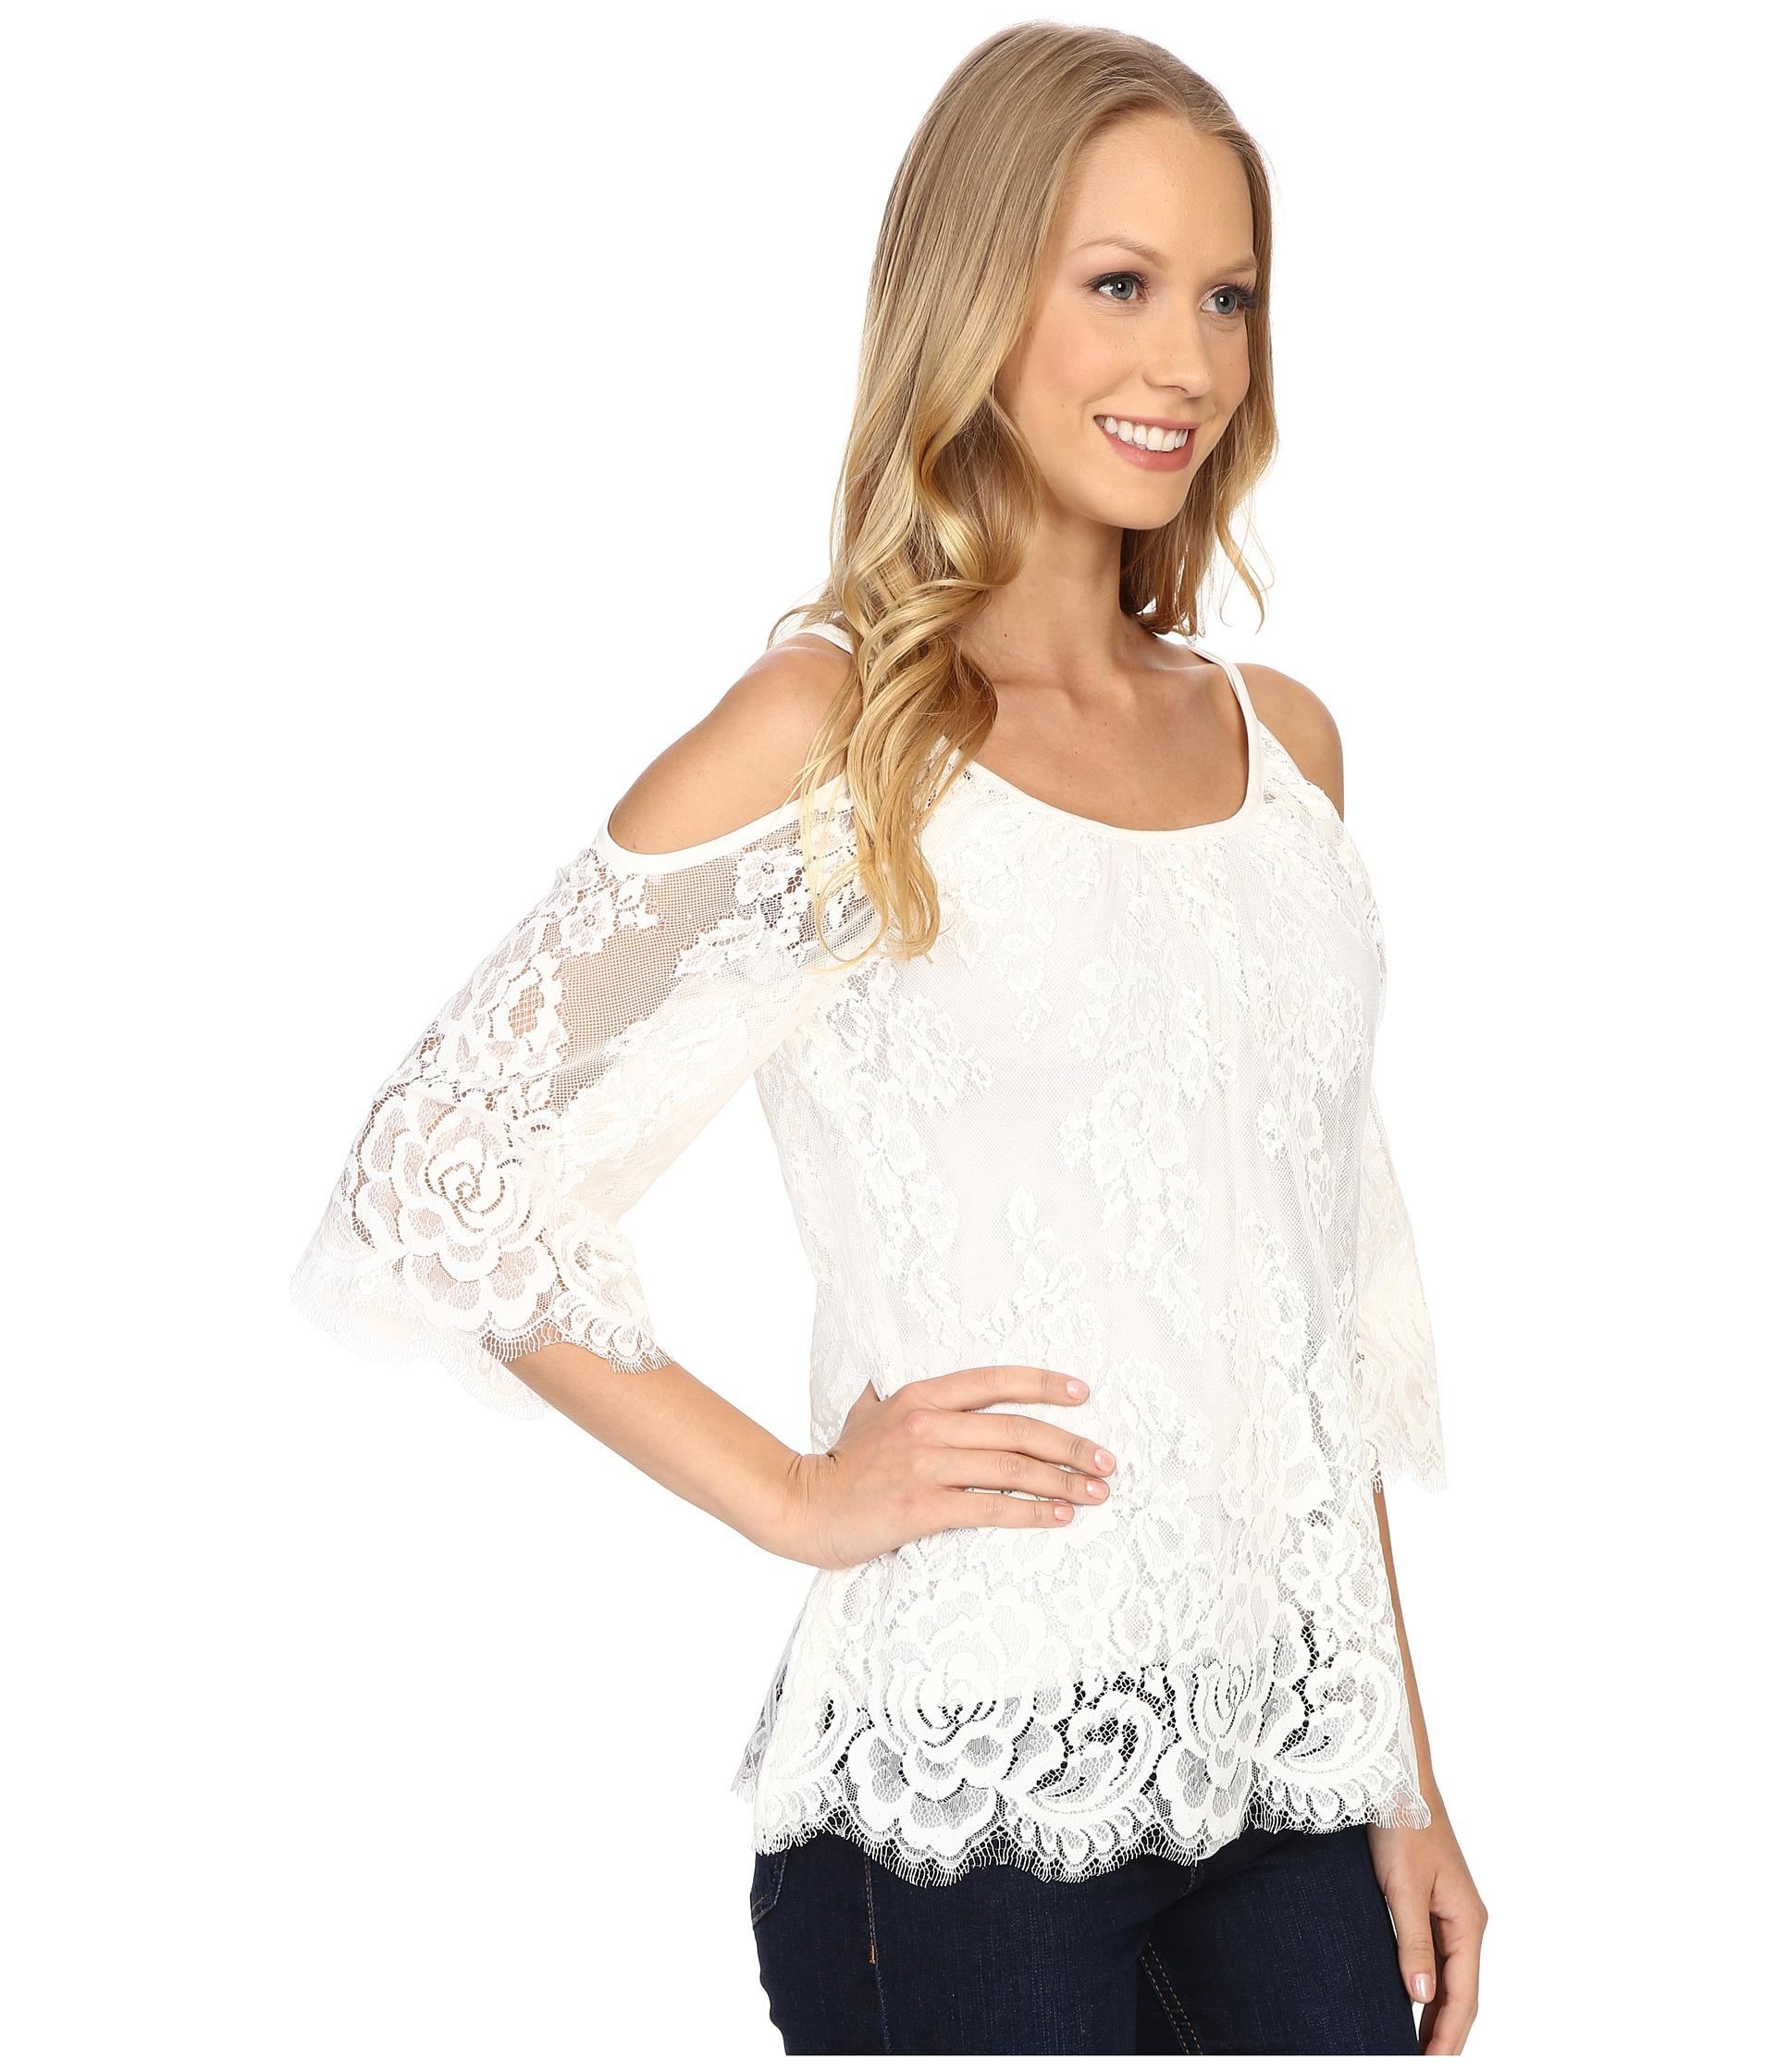 Lyst - Karen Kane Cold Shoulder Lace Top in White